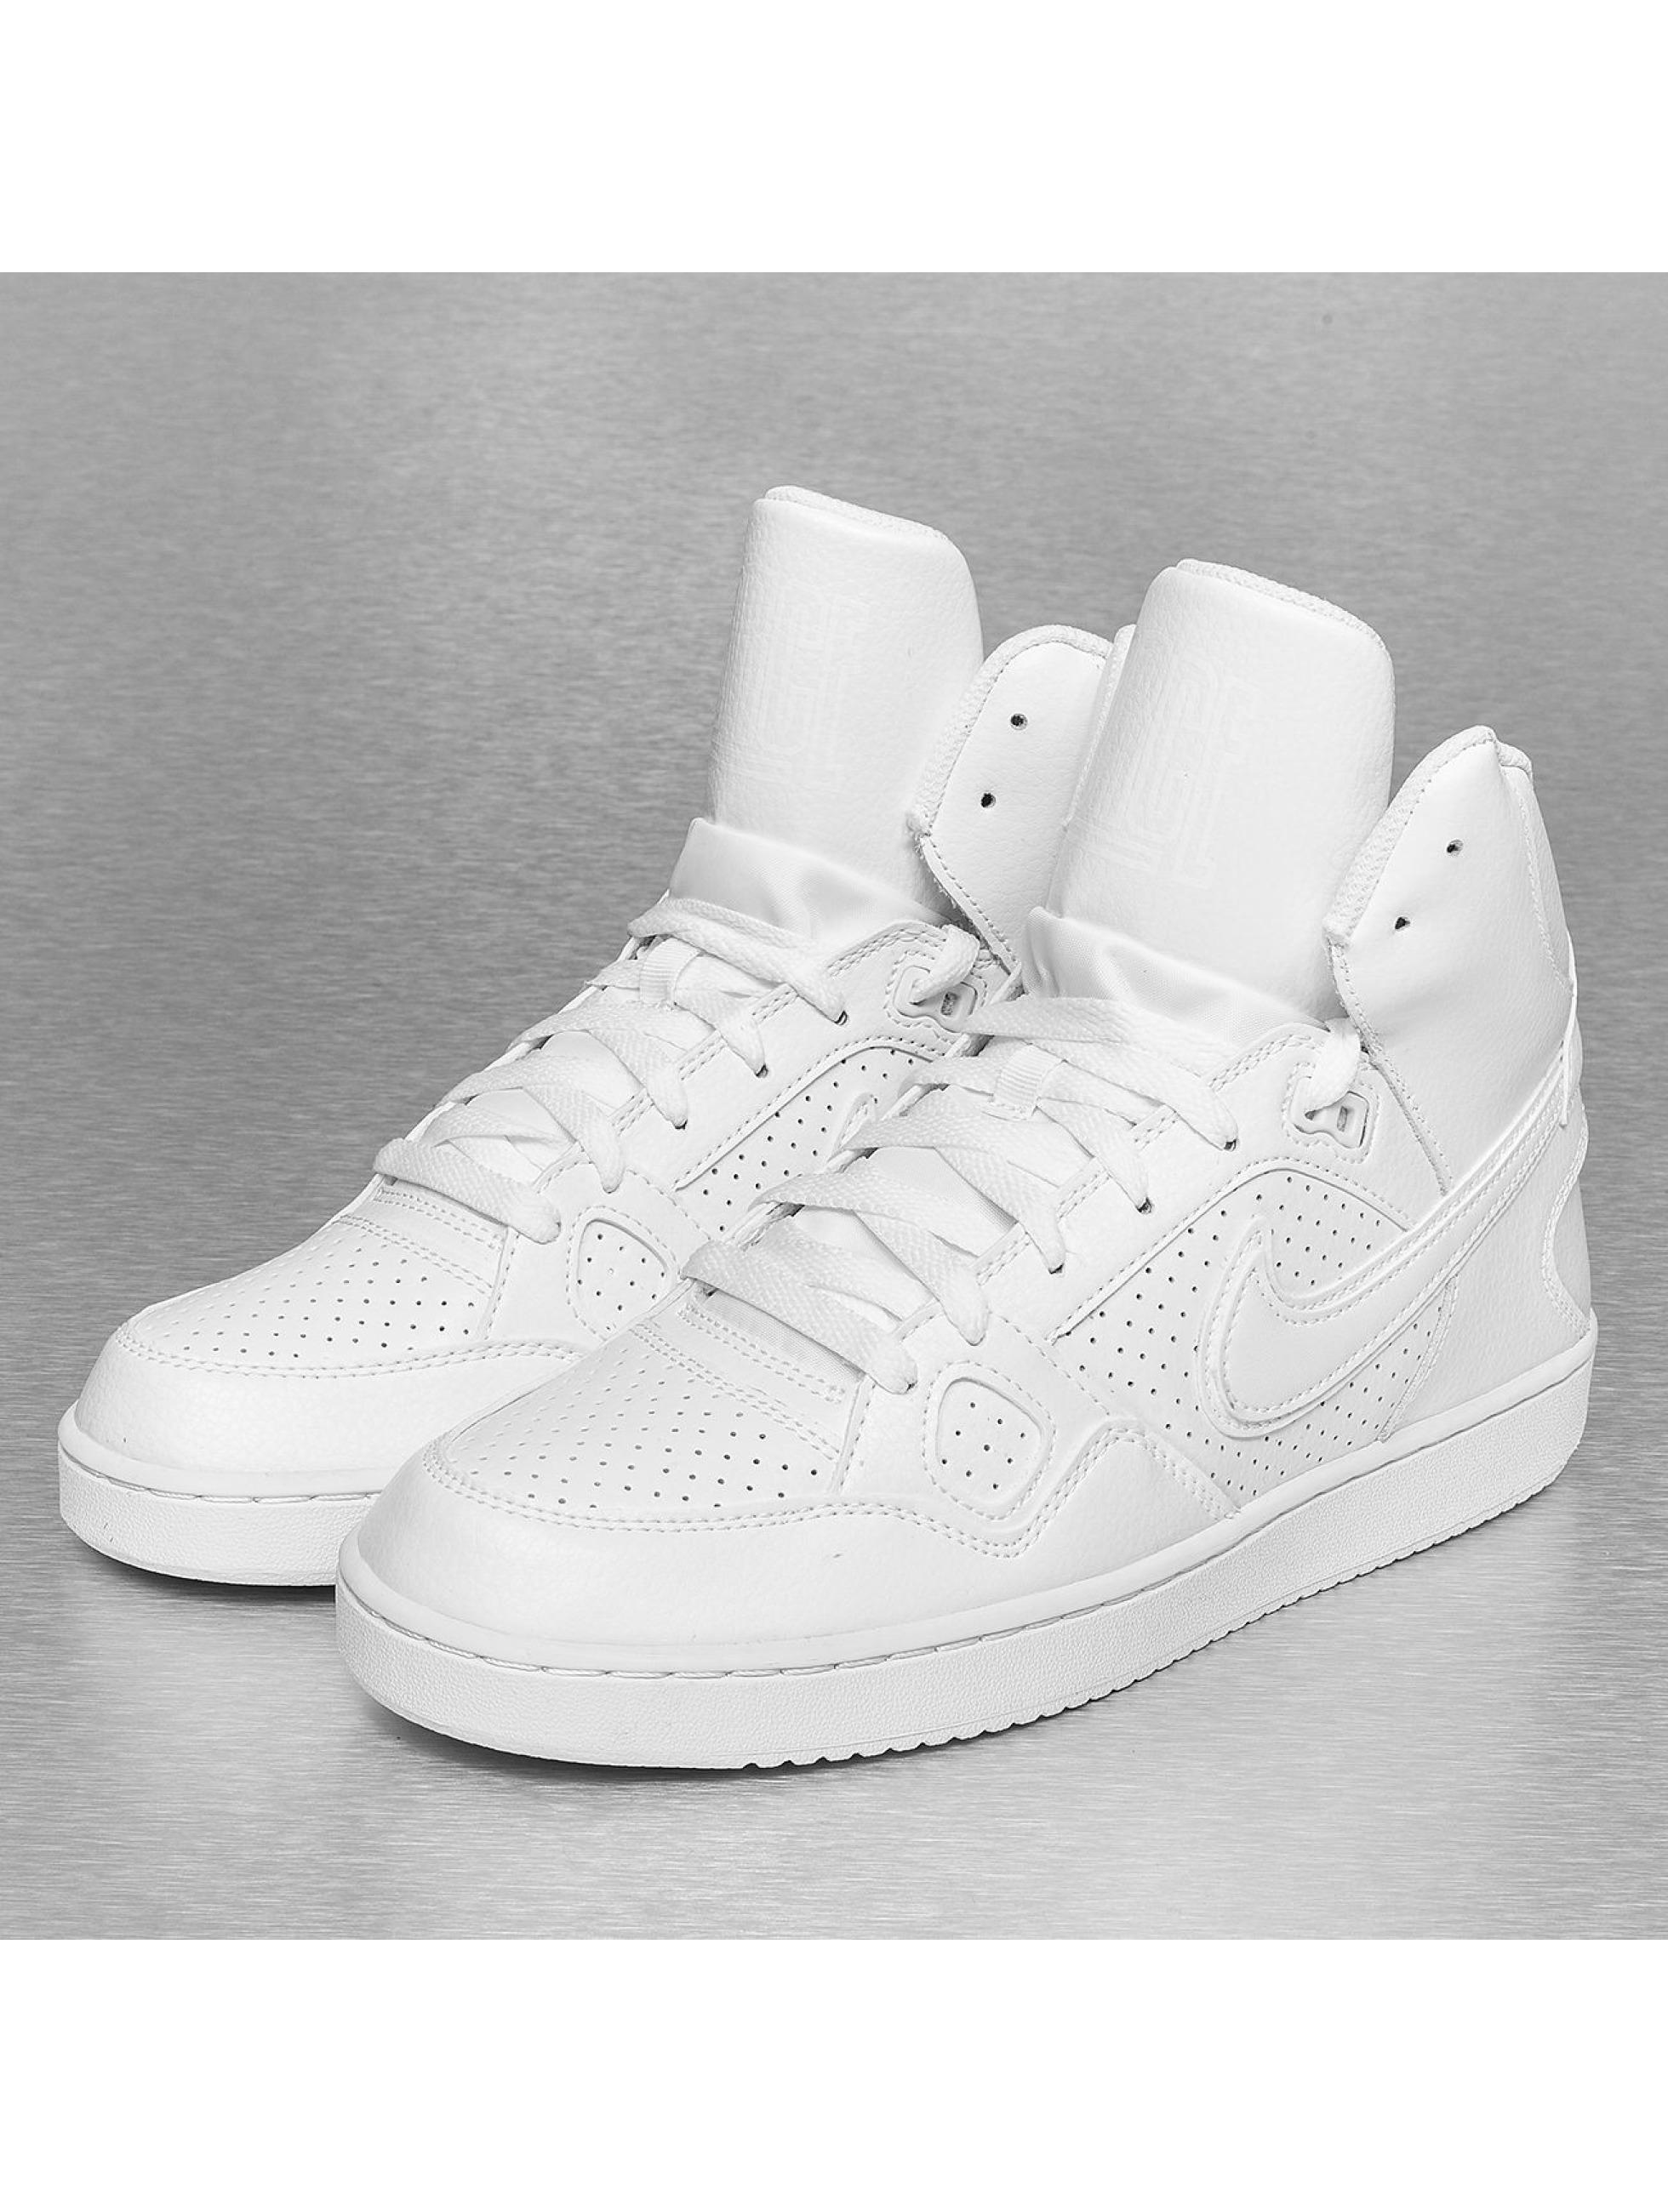 Nike Force Mid